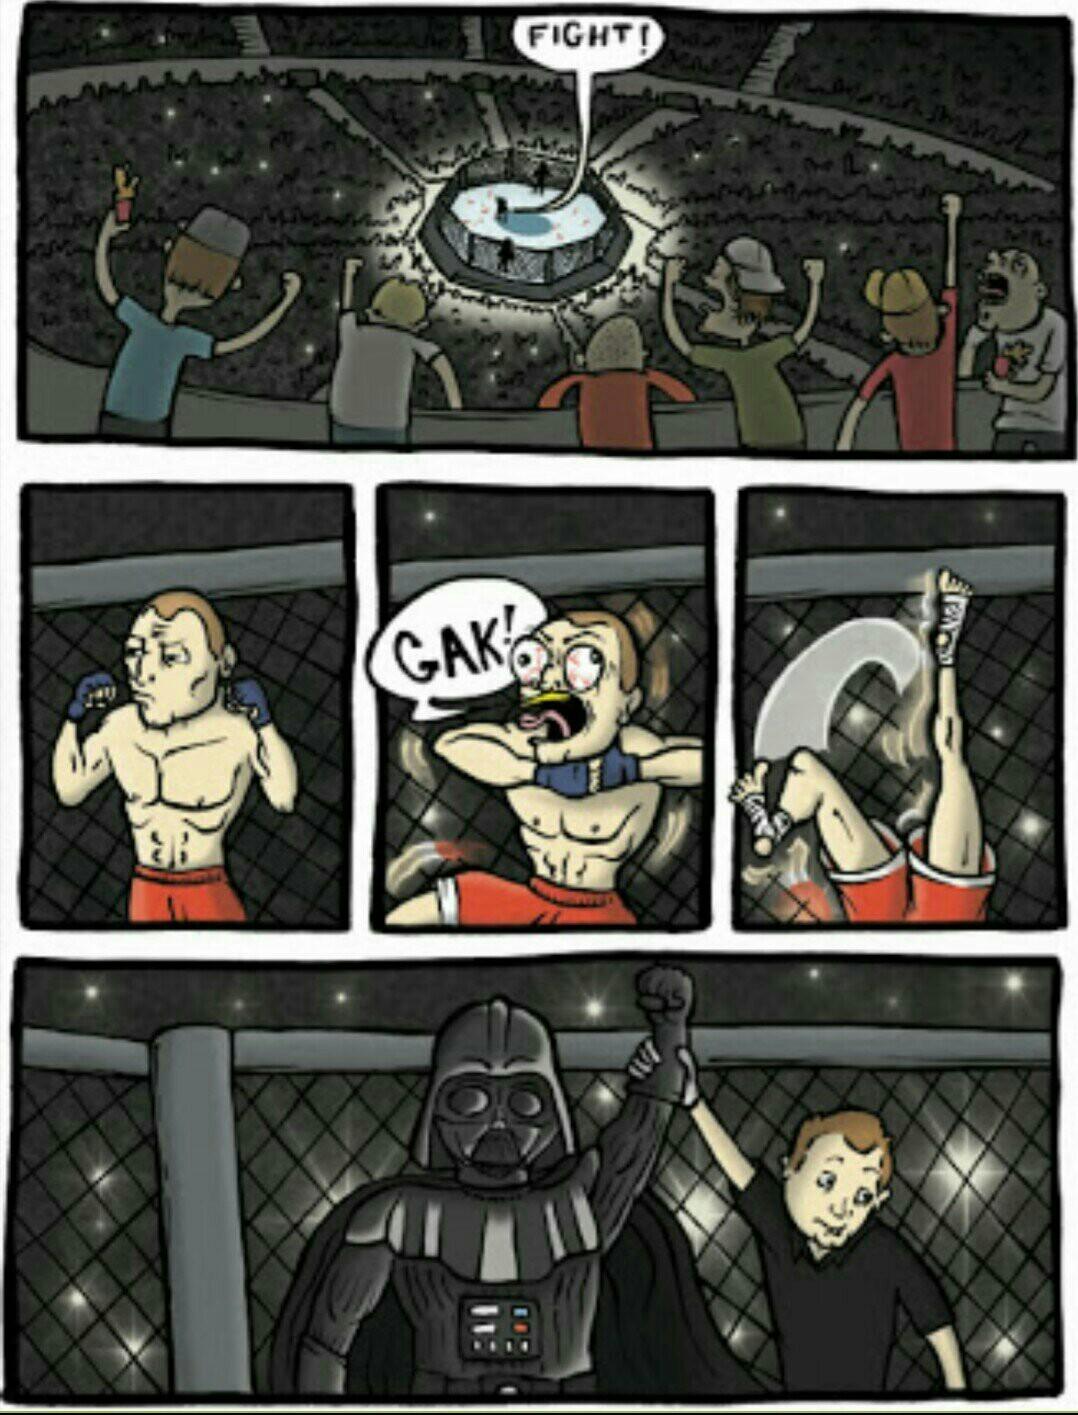 Darth Vader wins, follow victory! - meme